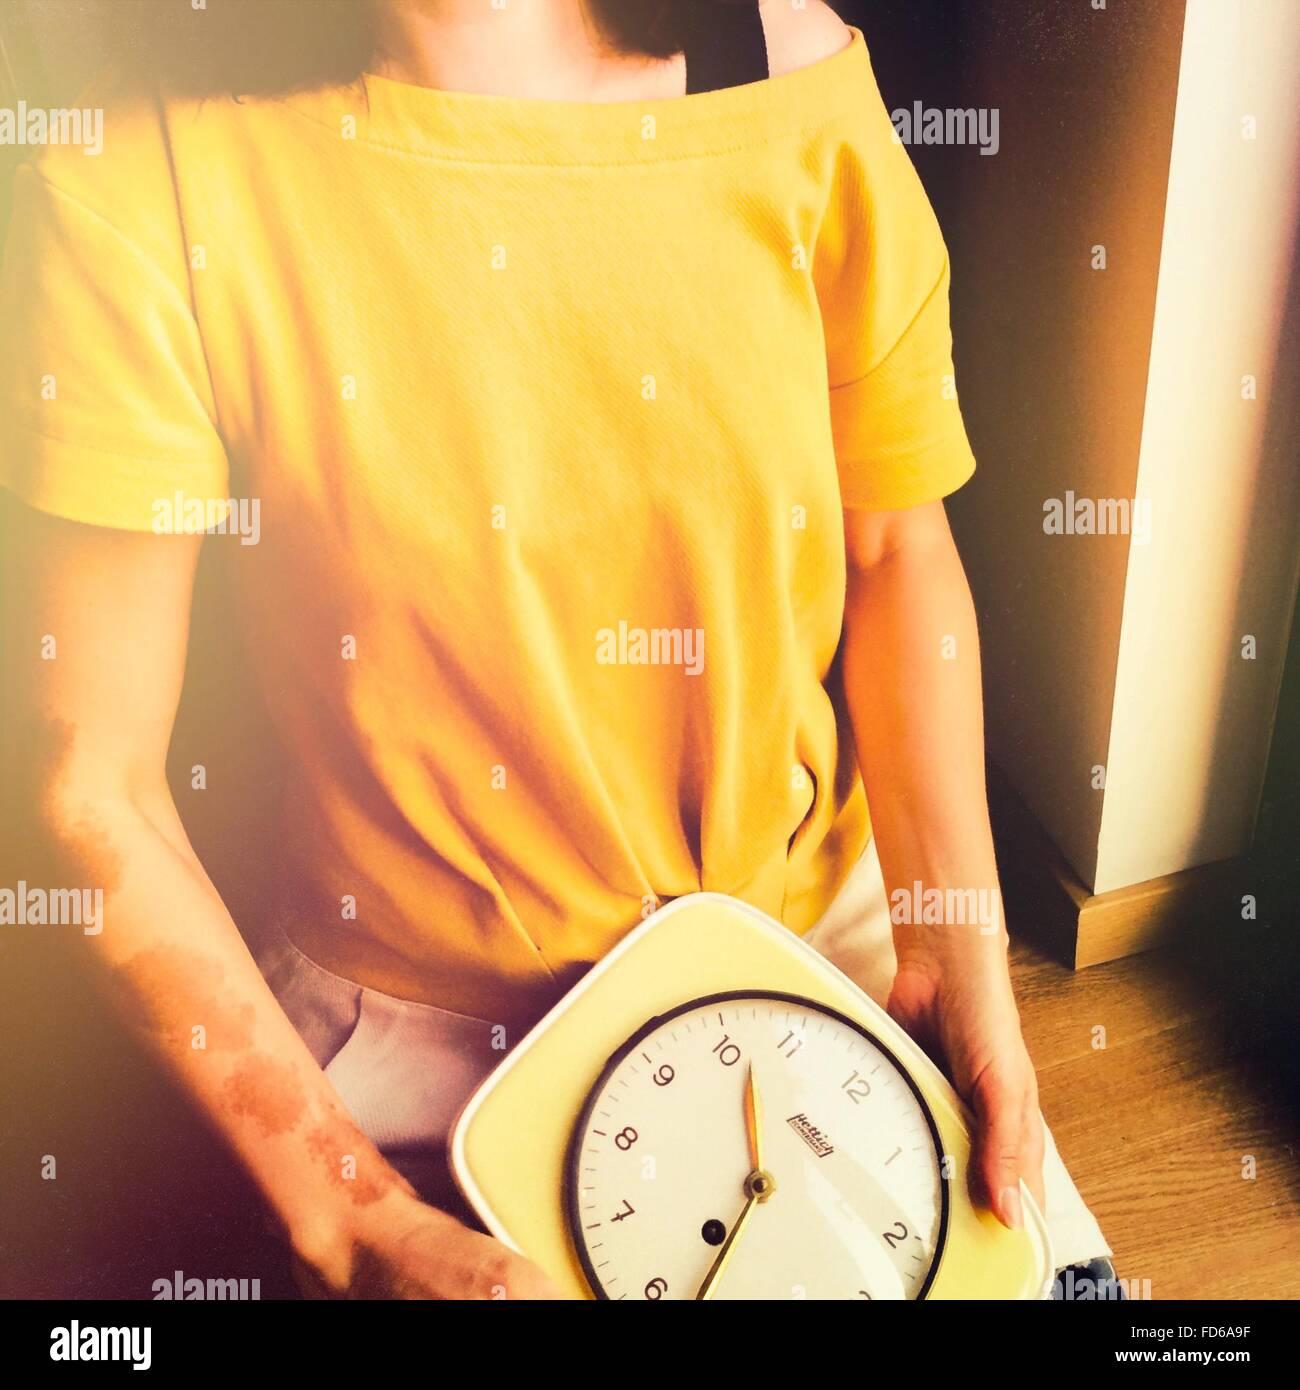 Mujer sosteniendo un reloj Imagen De Stock